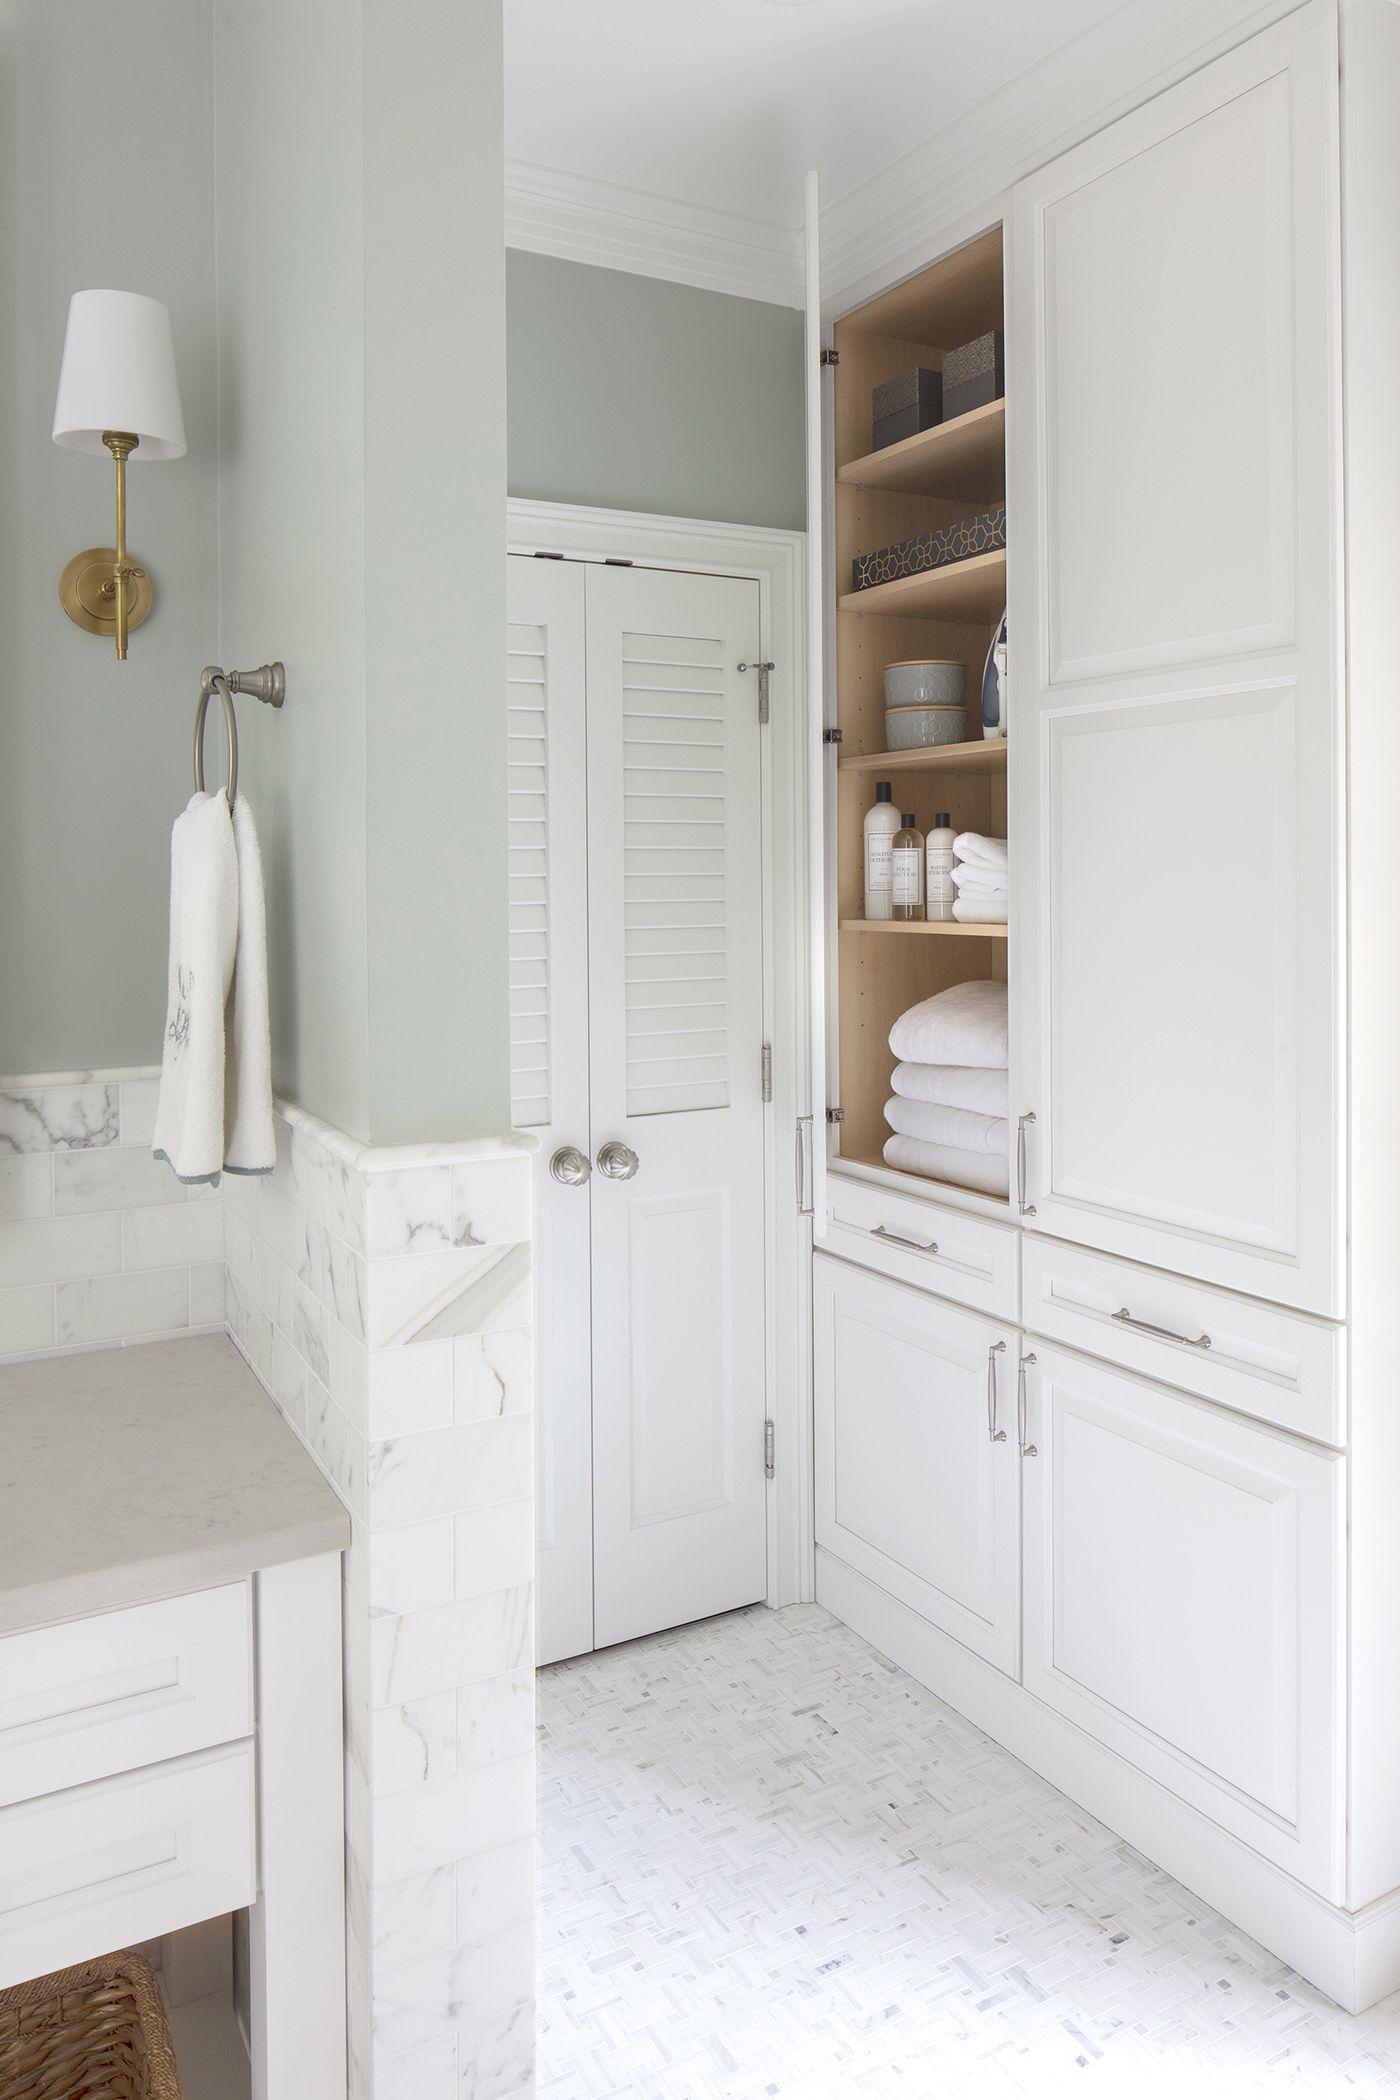 Brilliant Tips For Making Your Small Bathroom Feel Larger Bathroom Space Saver Bathroom Linen Closet Bathroom Space